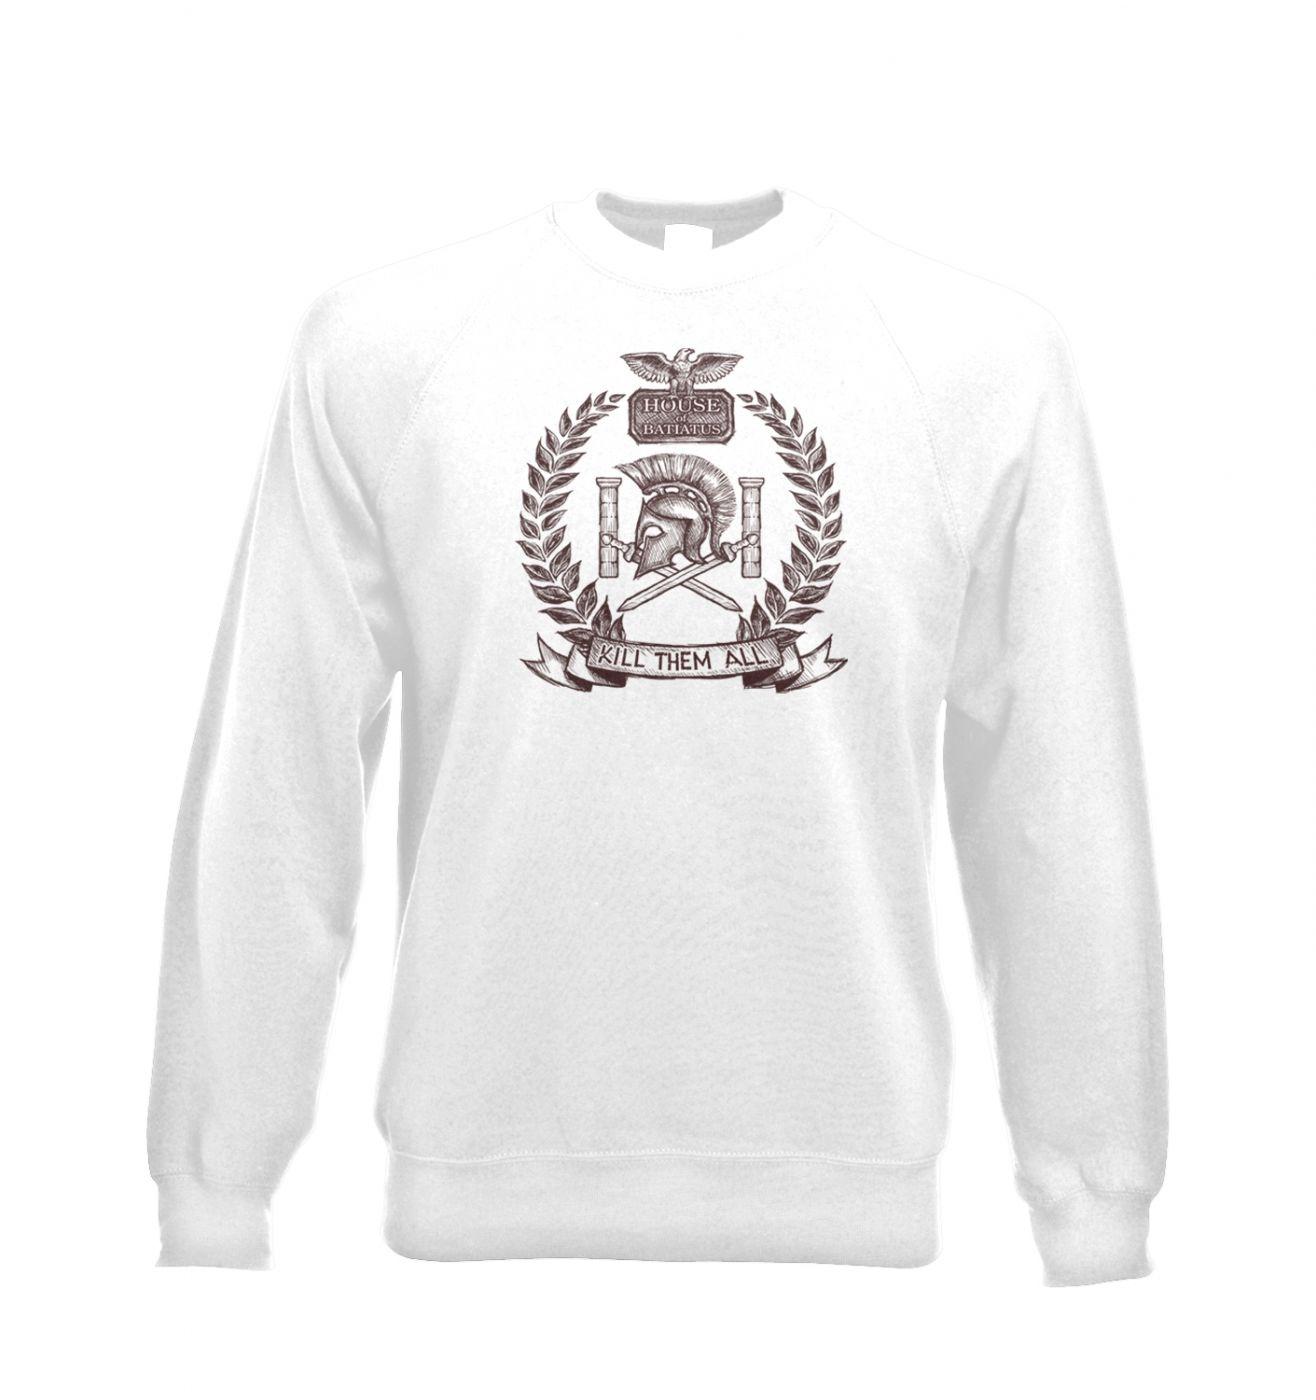 Brown house Batiatus unisex crewneck sweatshirt